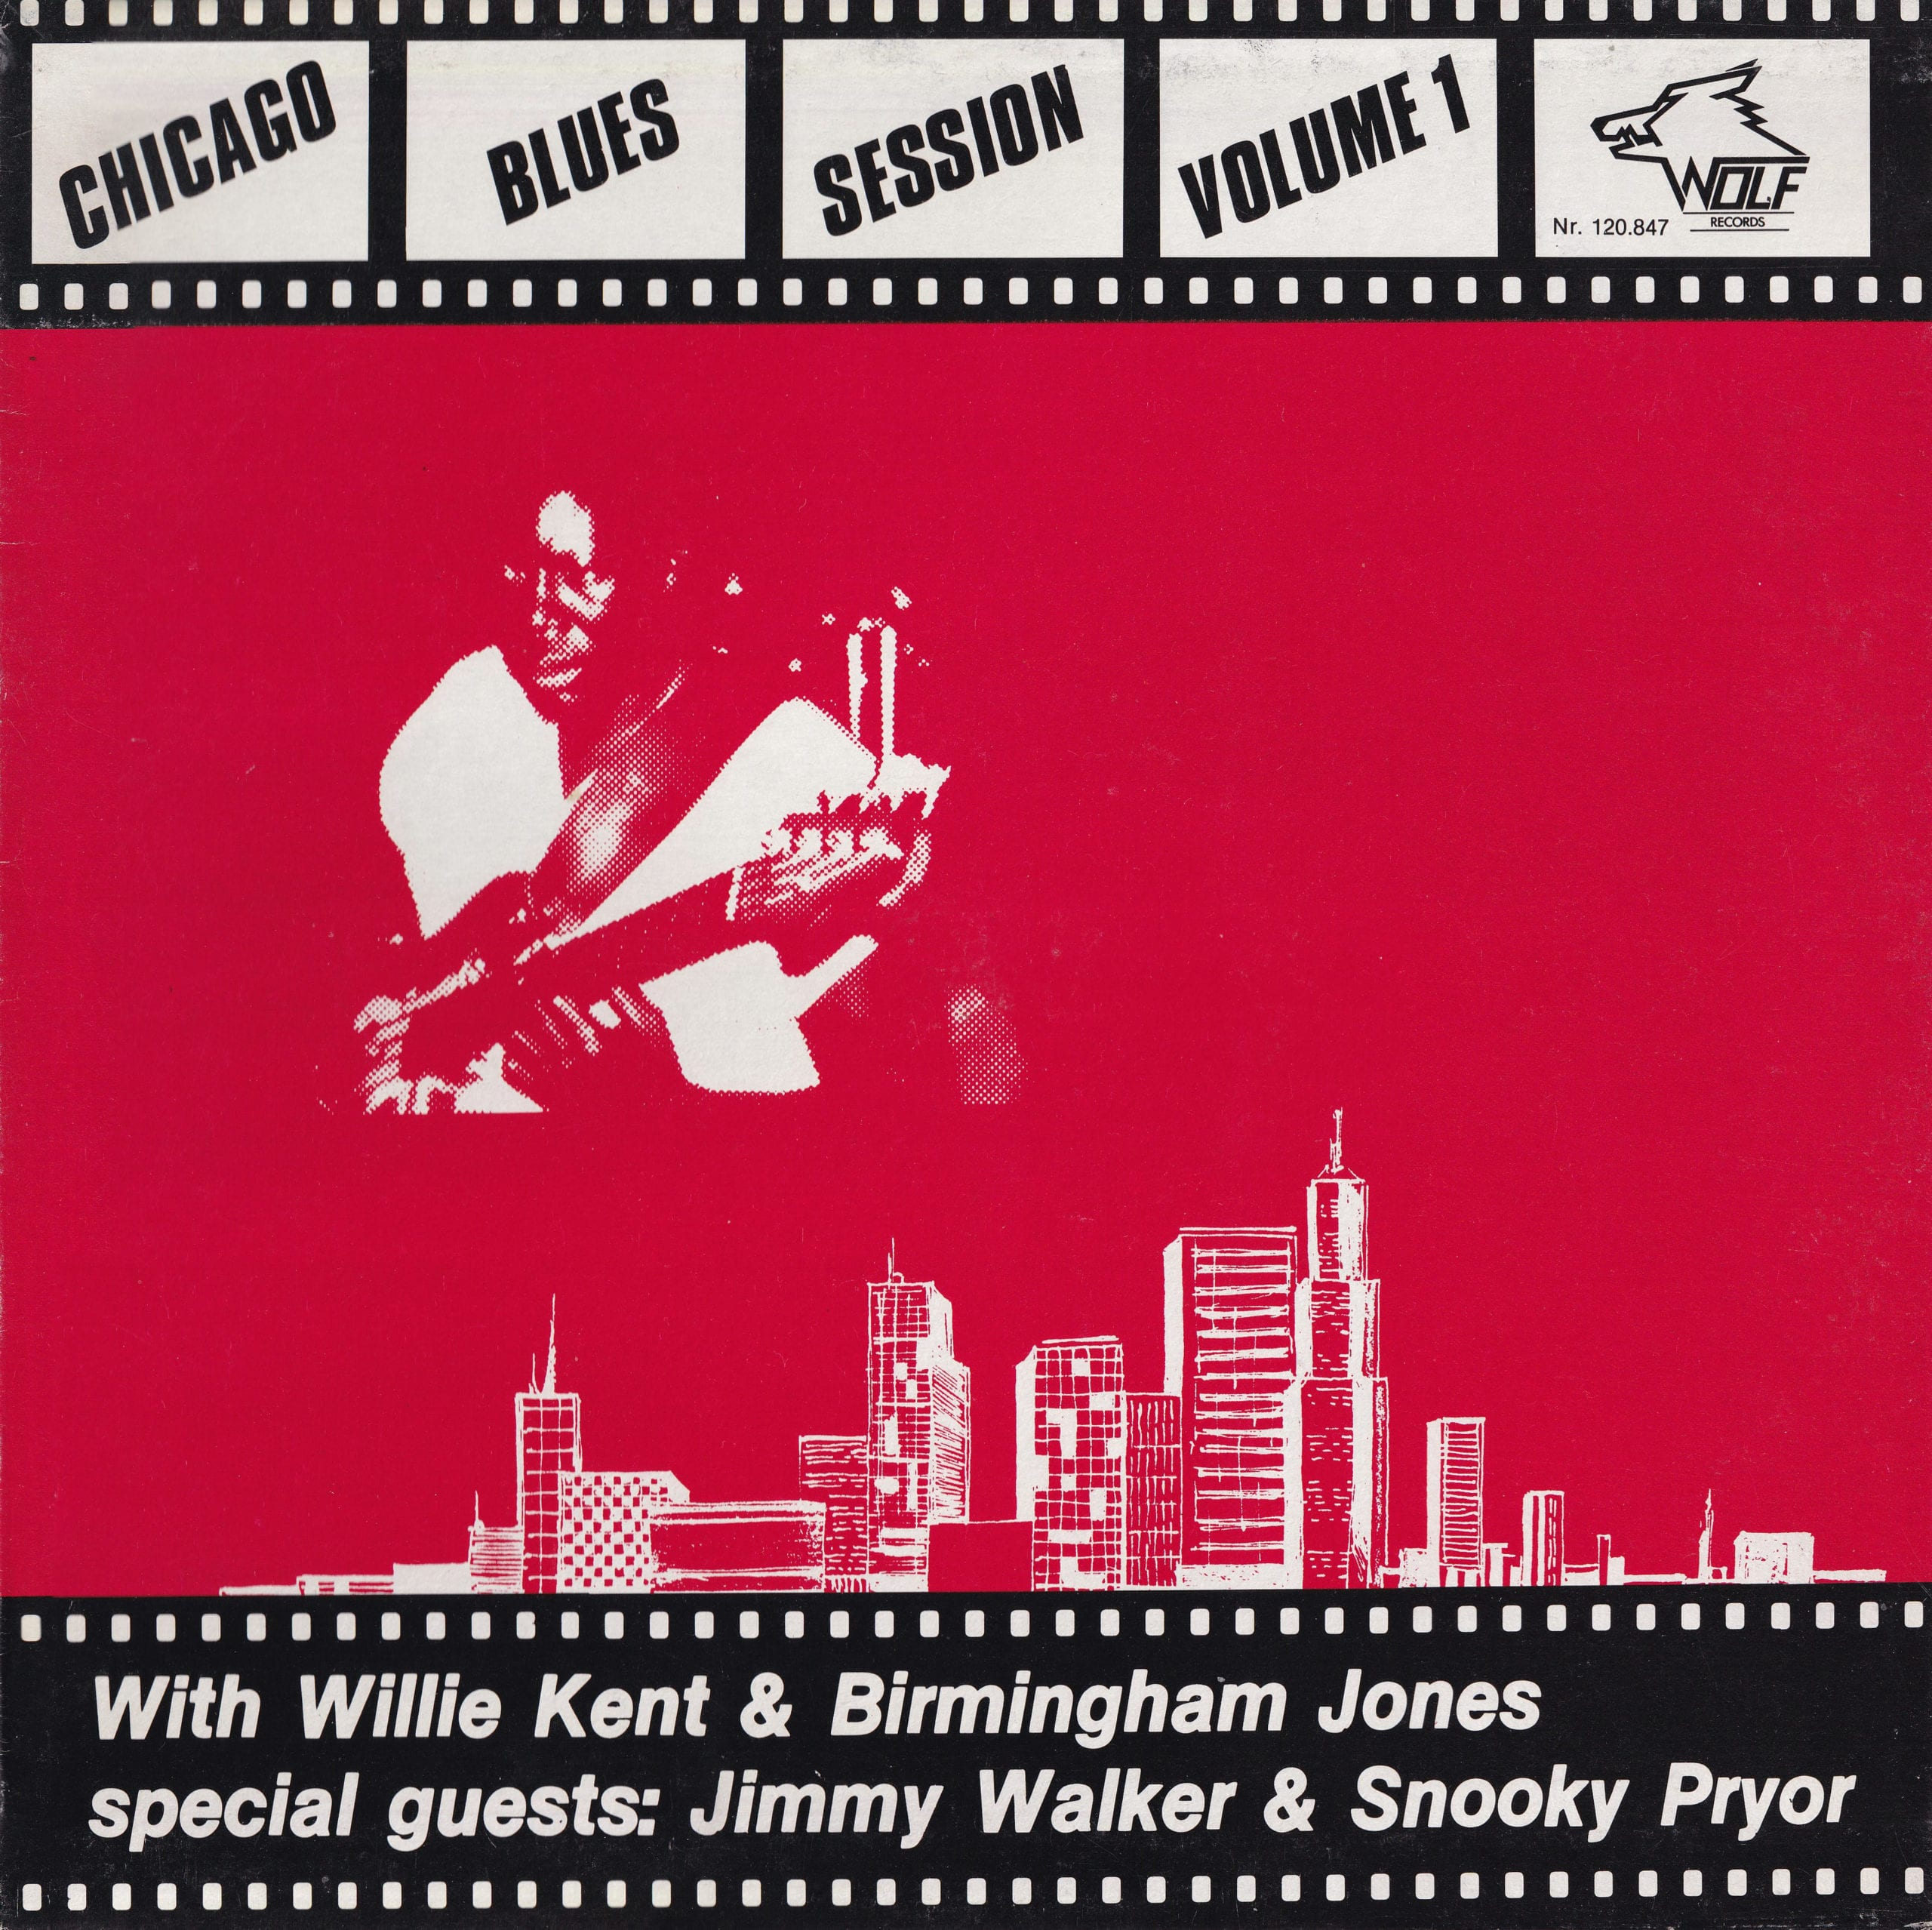 Chicago Blues Session Vol. 1 – 1